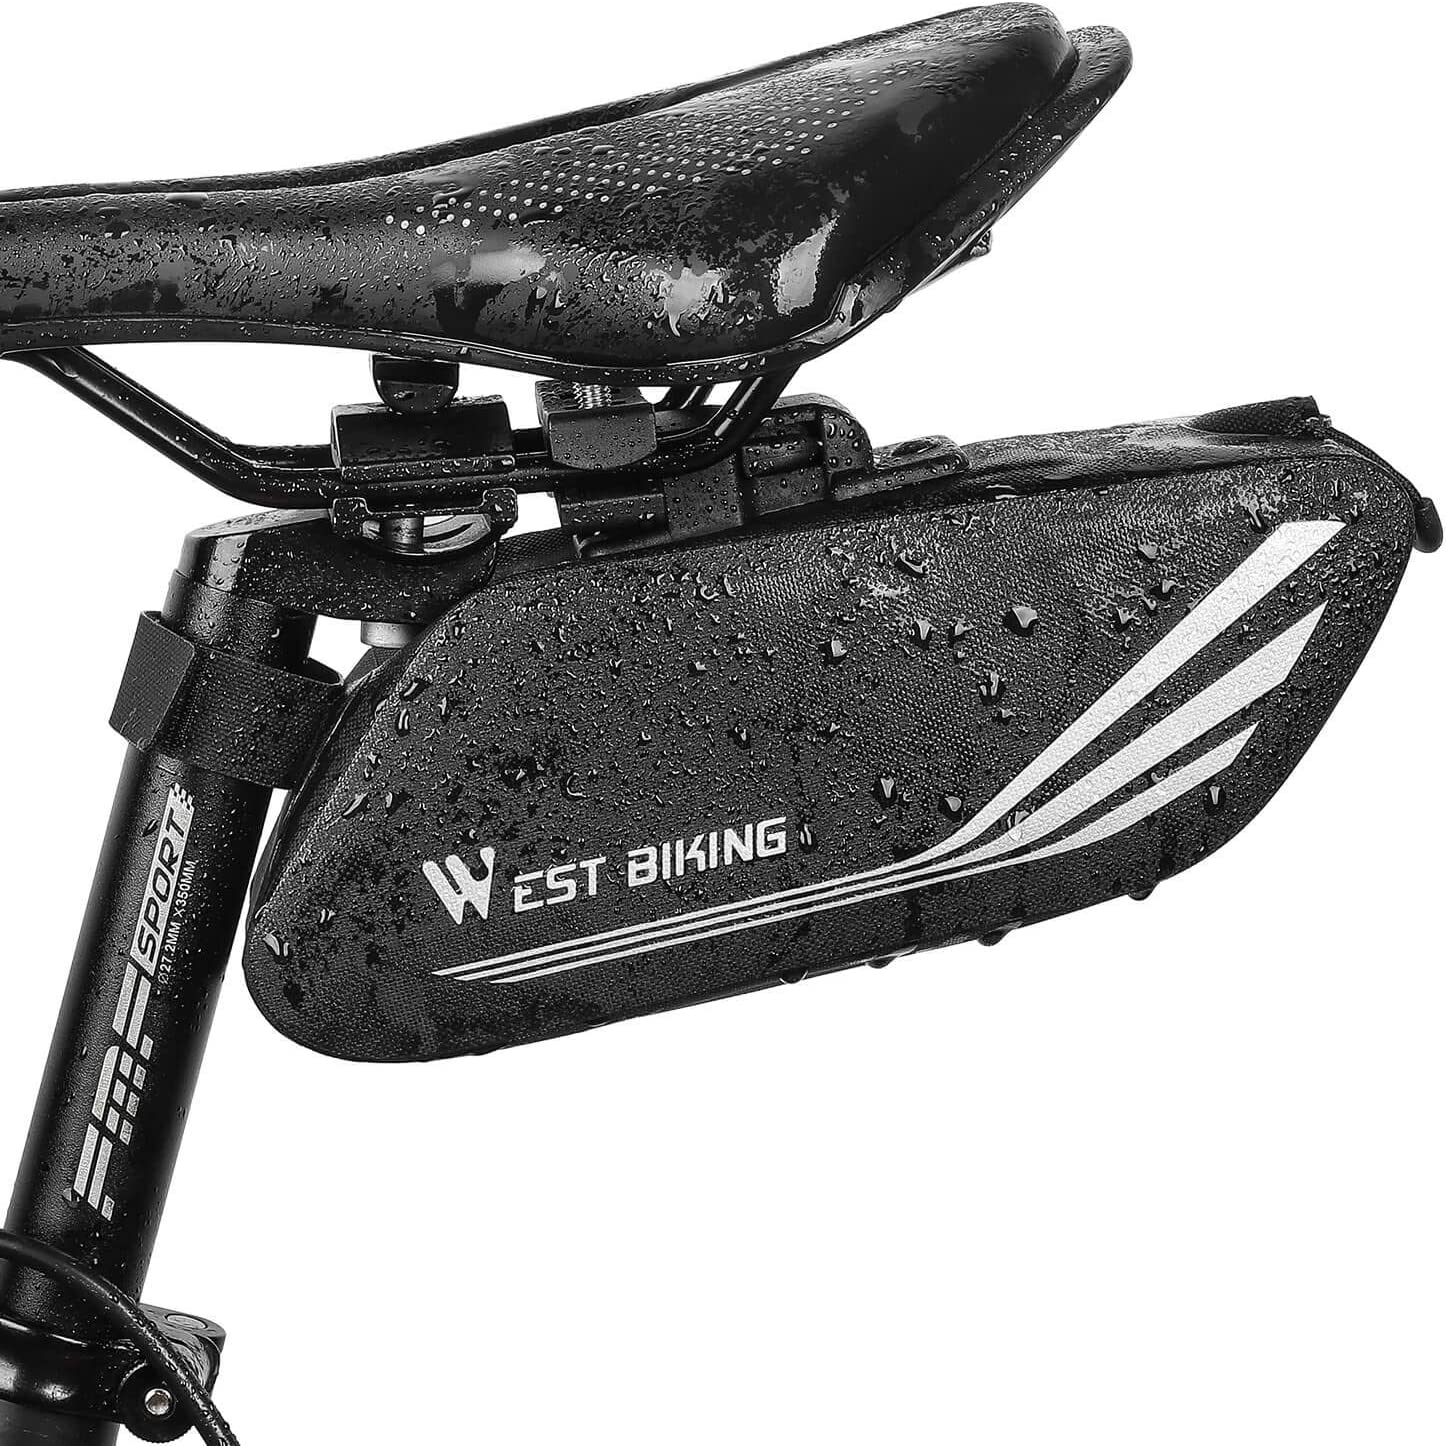 Light Bike Bicycle Cycling Saddle Bag Seat Storage Tail Rear Pouch 56g fast ship